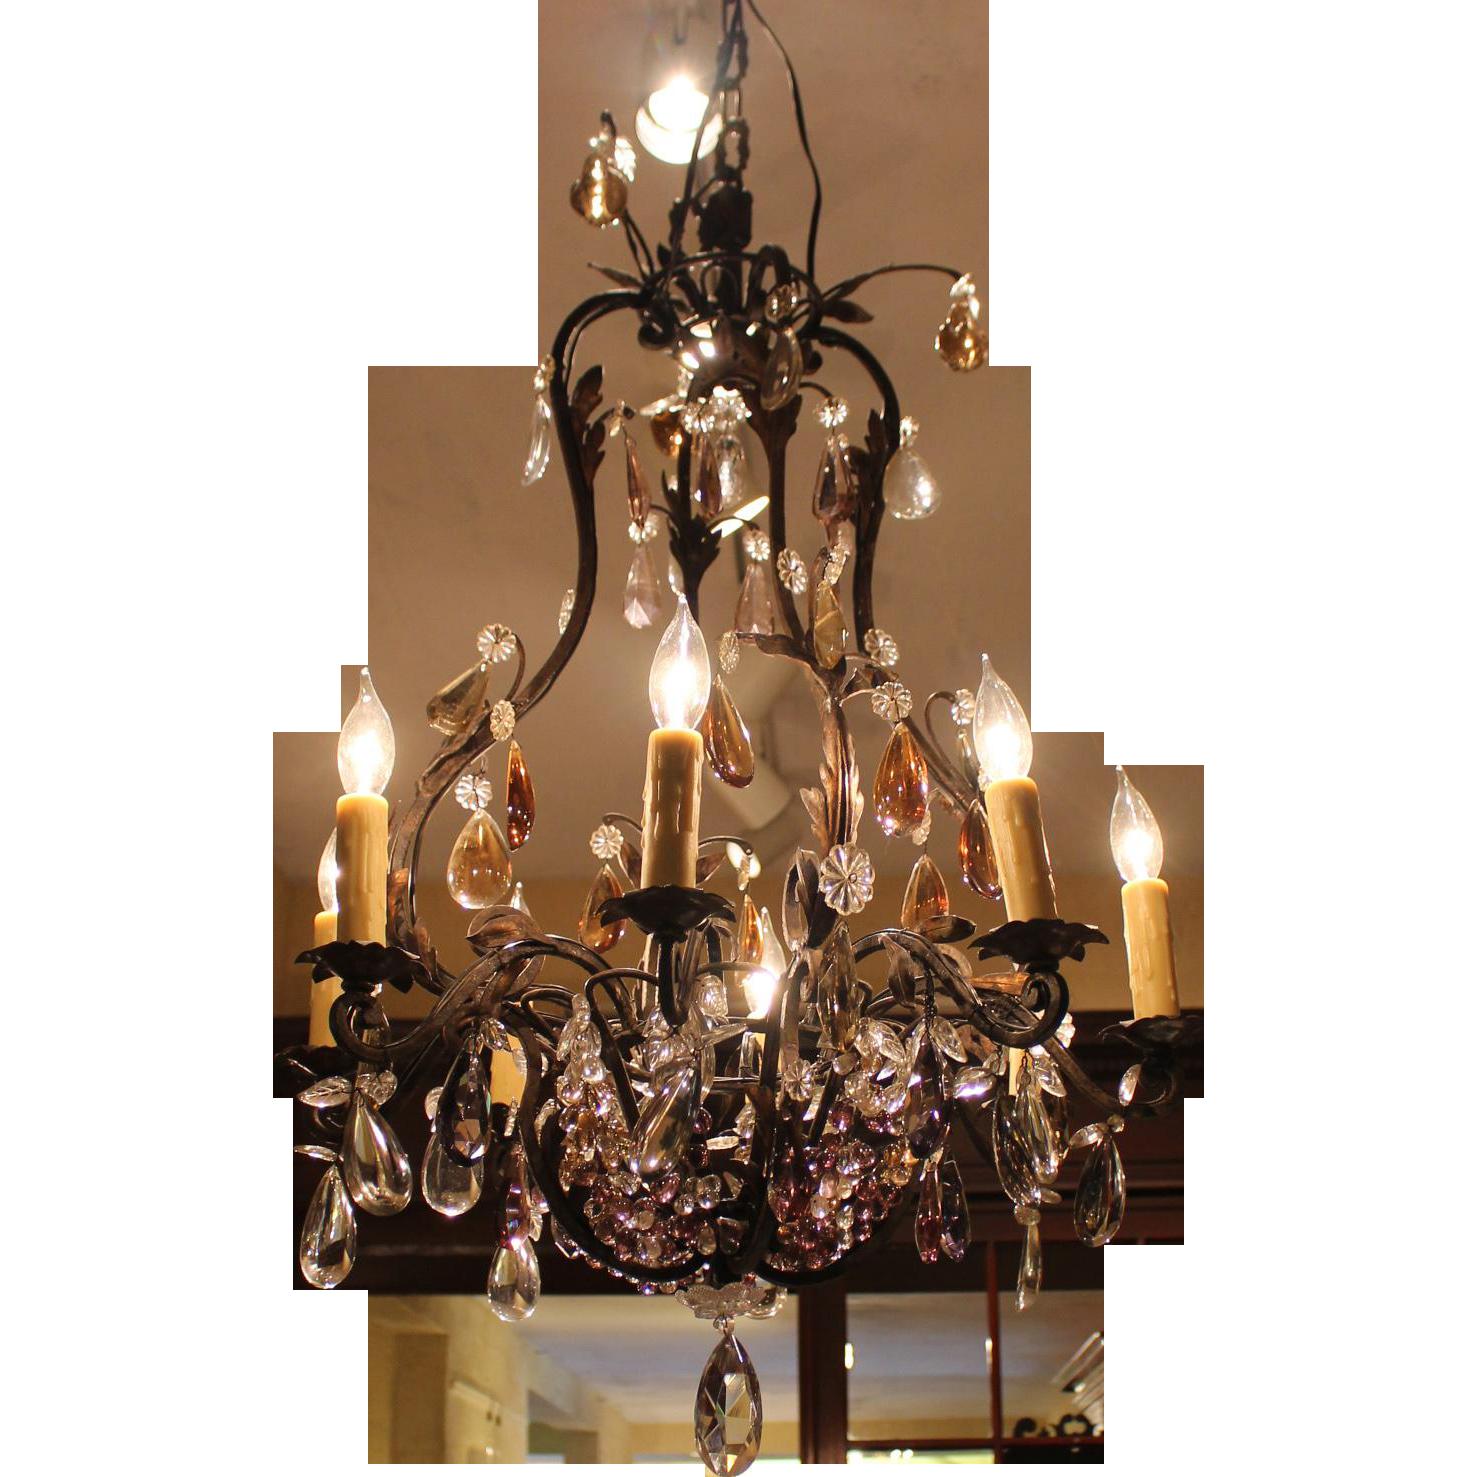 Blacked Scrolled Metal 8 Light Chandelier Whitehall